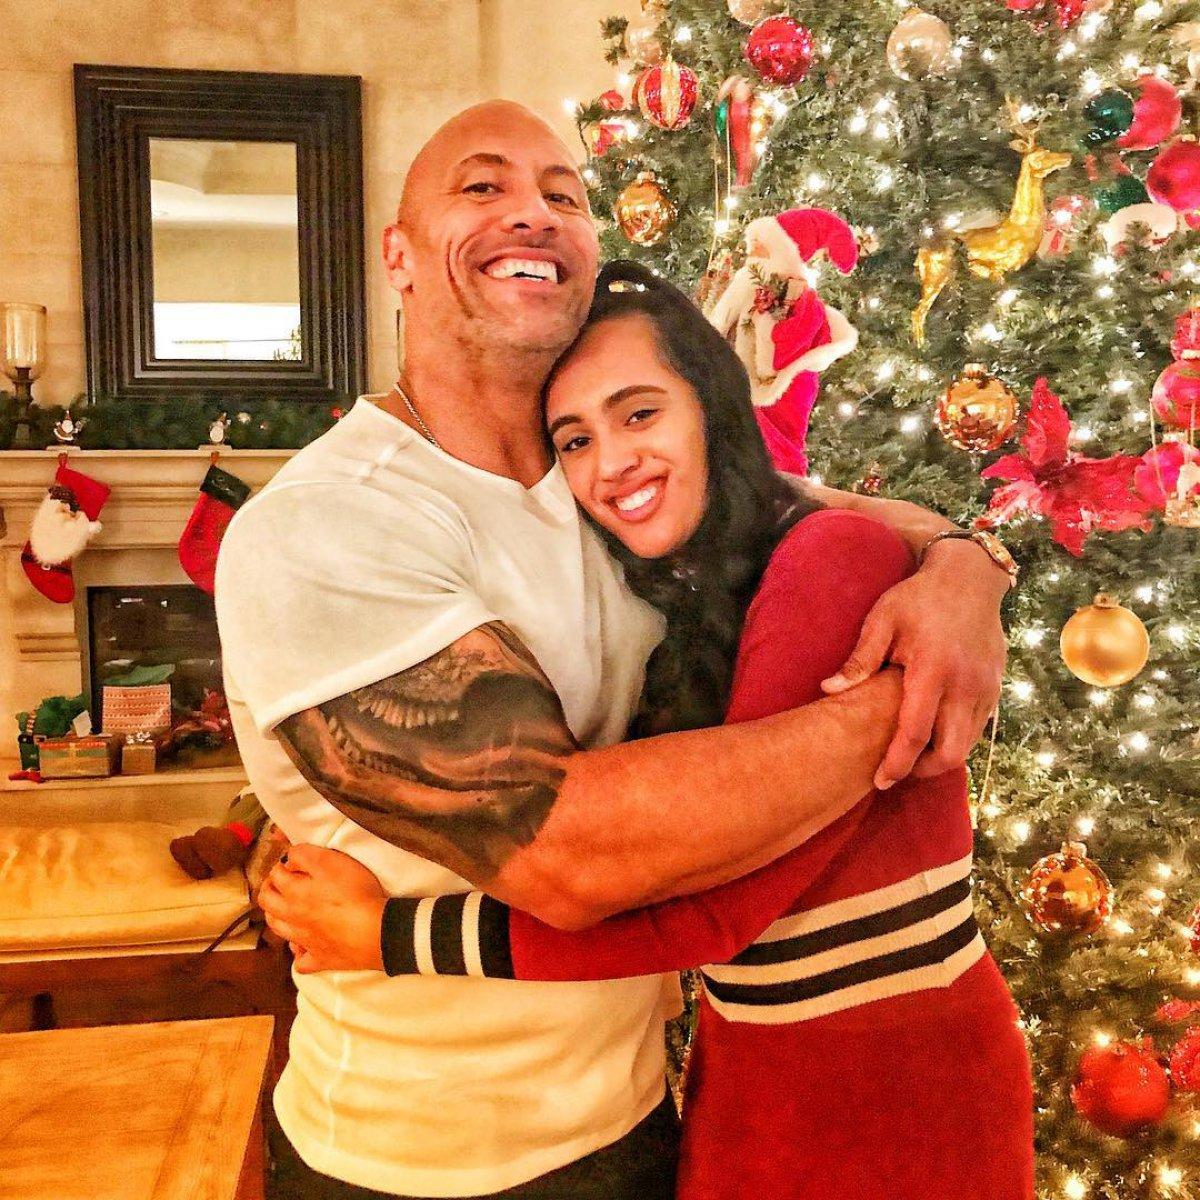 Dwayne Johnson and Kardashian family celebrate Christmas on social ...